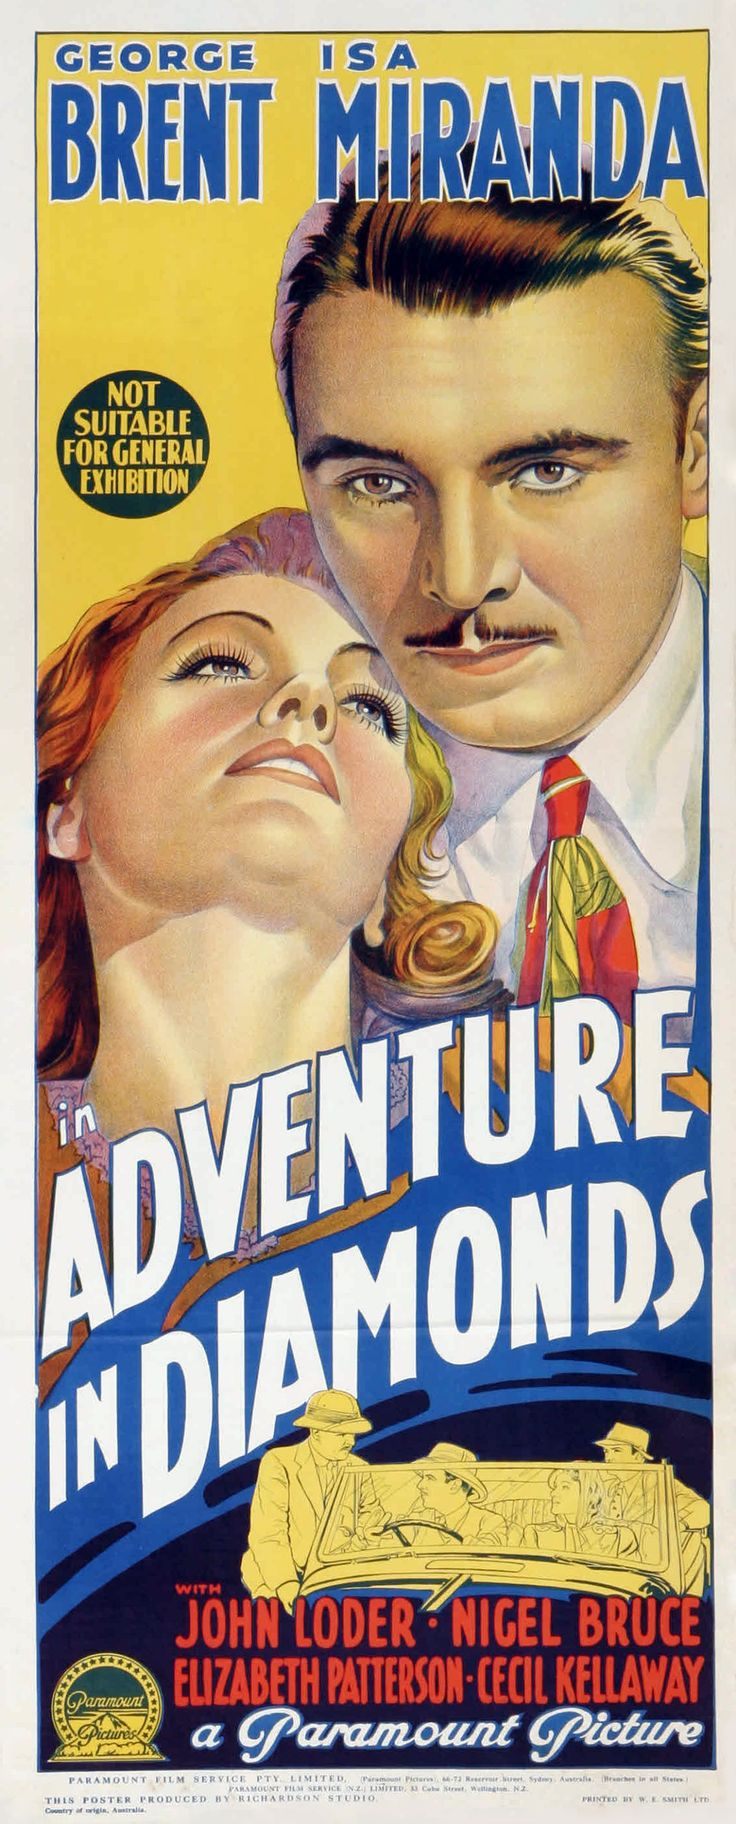 Adventure in Diamonds (1940) Stars: George Brent, Isa Miranda, John Loder, Nigel Bruce, Cecil Kellaway ~ Director: George Fitzmaurice (Australian Daybill)